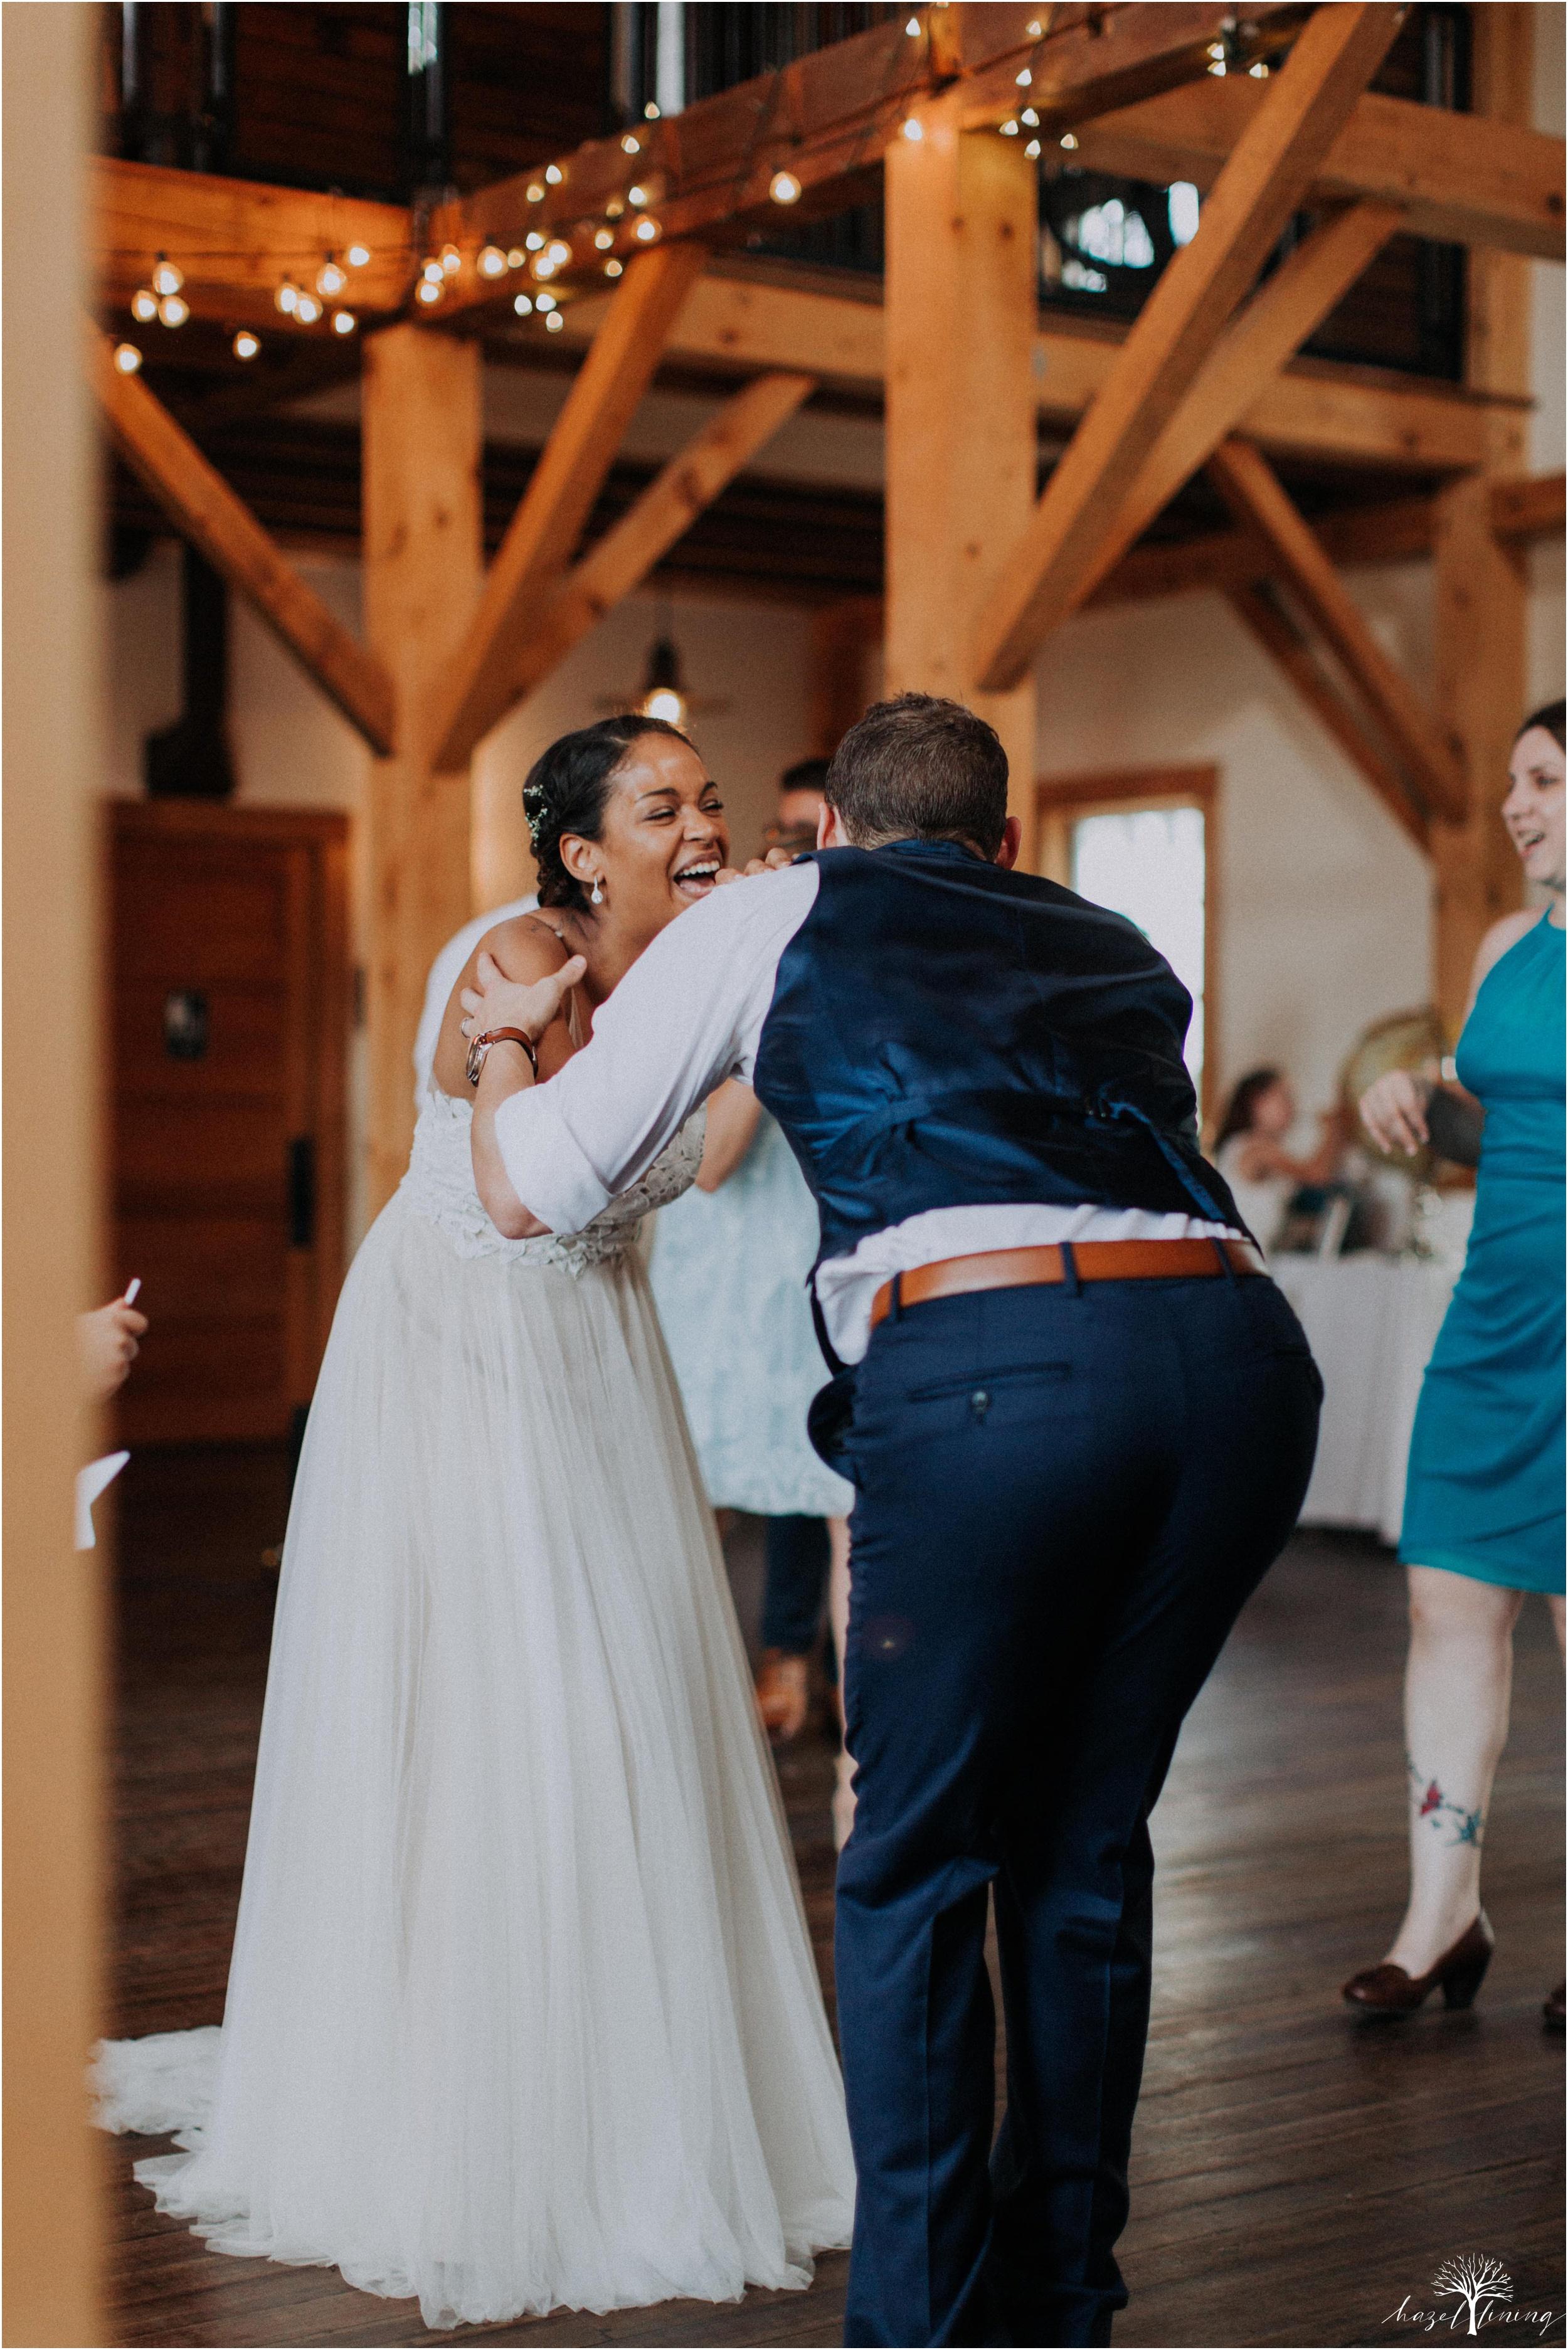 mariah-kreyling-samuel-sherratt-sherrattwiththeworld-peirce-farm-at-witch-hill-boston-massachusetts-wedding-photography-hazel-lining-travel-wedding-elopement-photography_0197.jpg